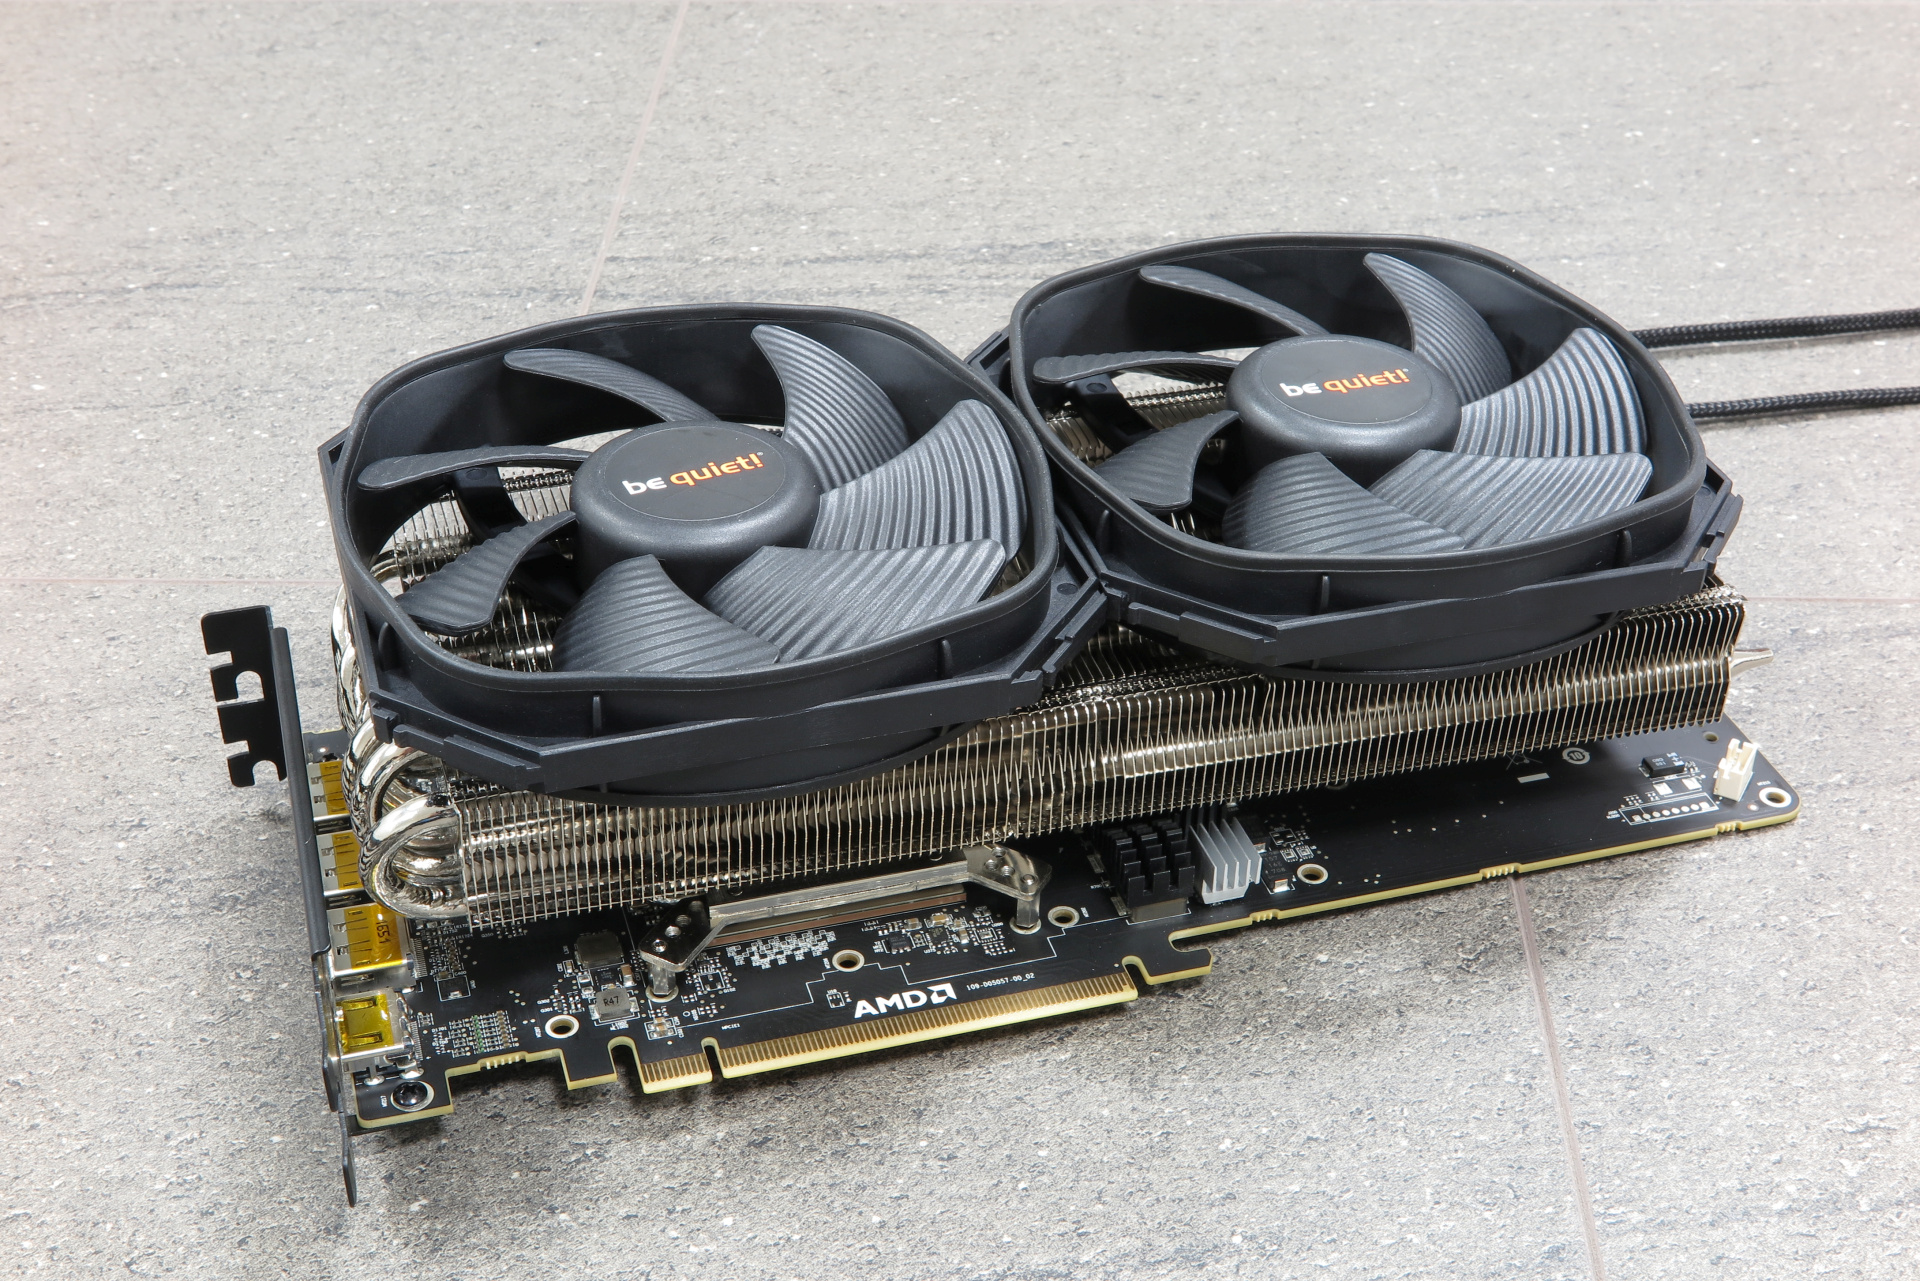 AMD-Radeon-Vega-Frontier-Edition-Morpheus-II-5--pcgh.jpg